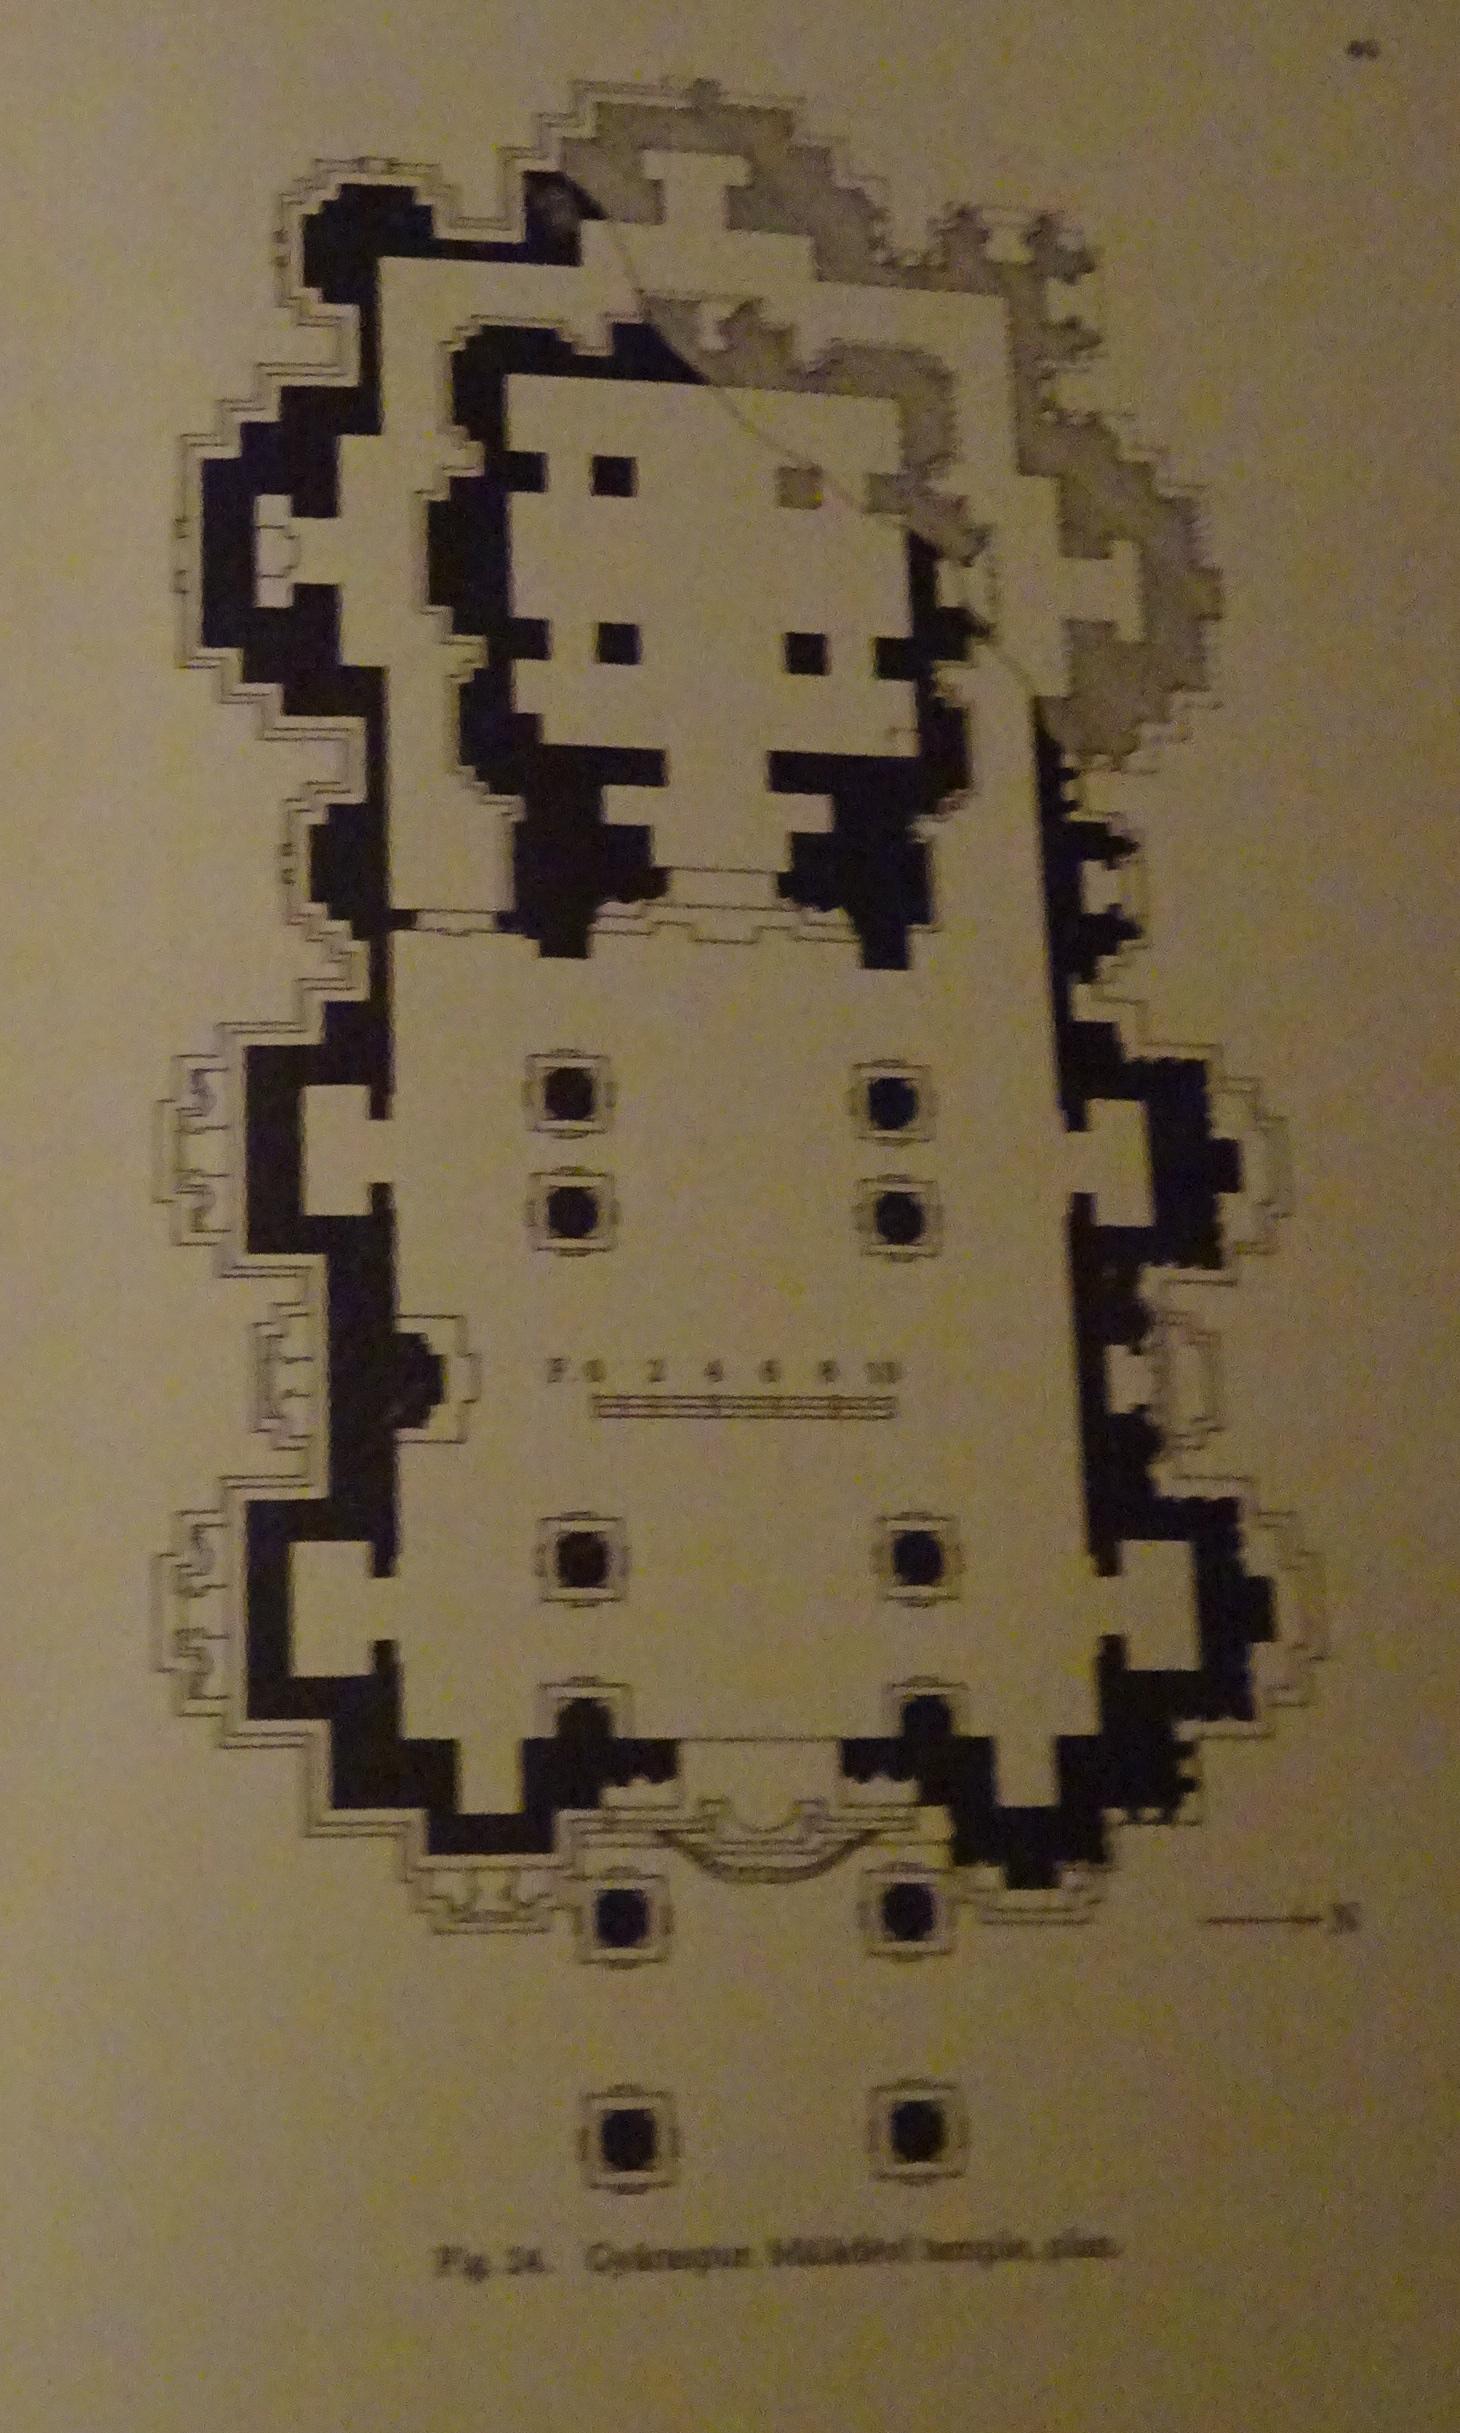 1 gyaraspur maladevi plan DSC04894